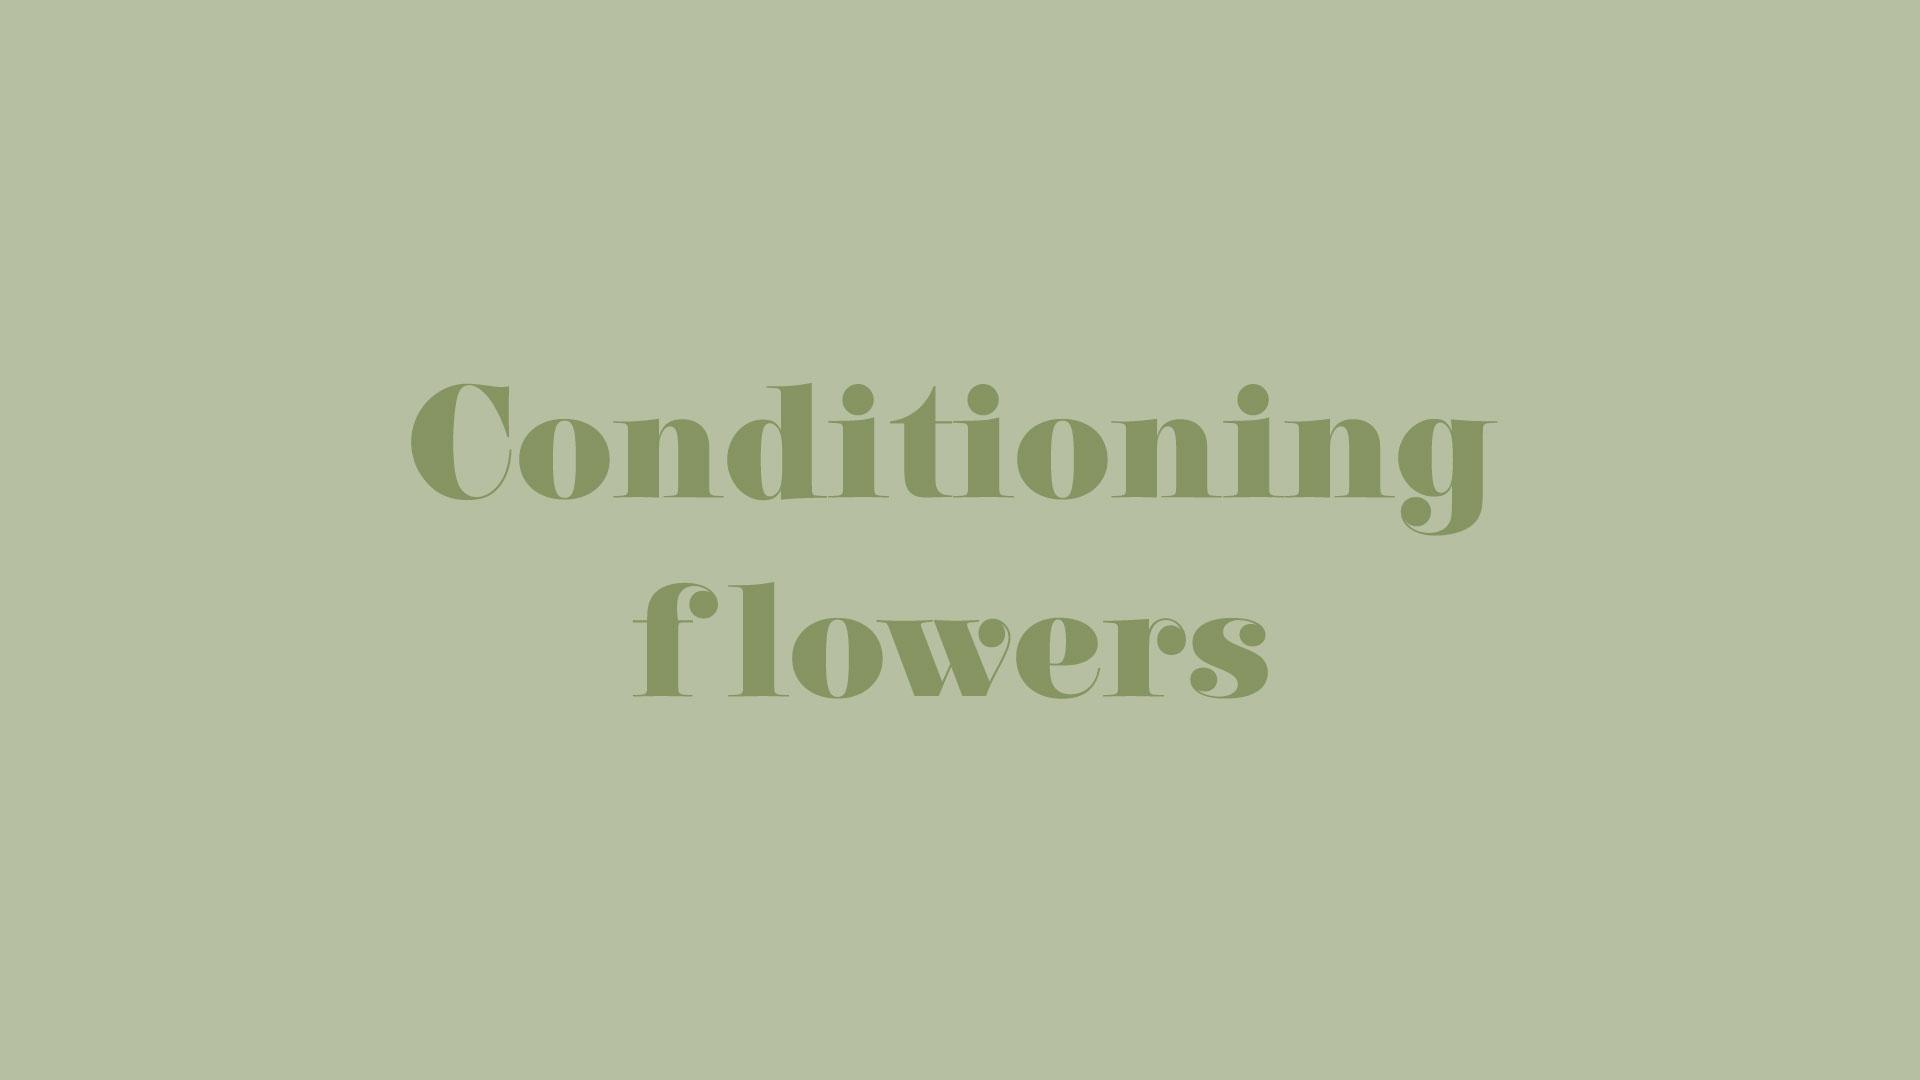 Title-ConditioningFlowers.jpg